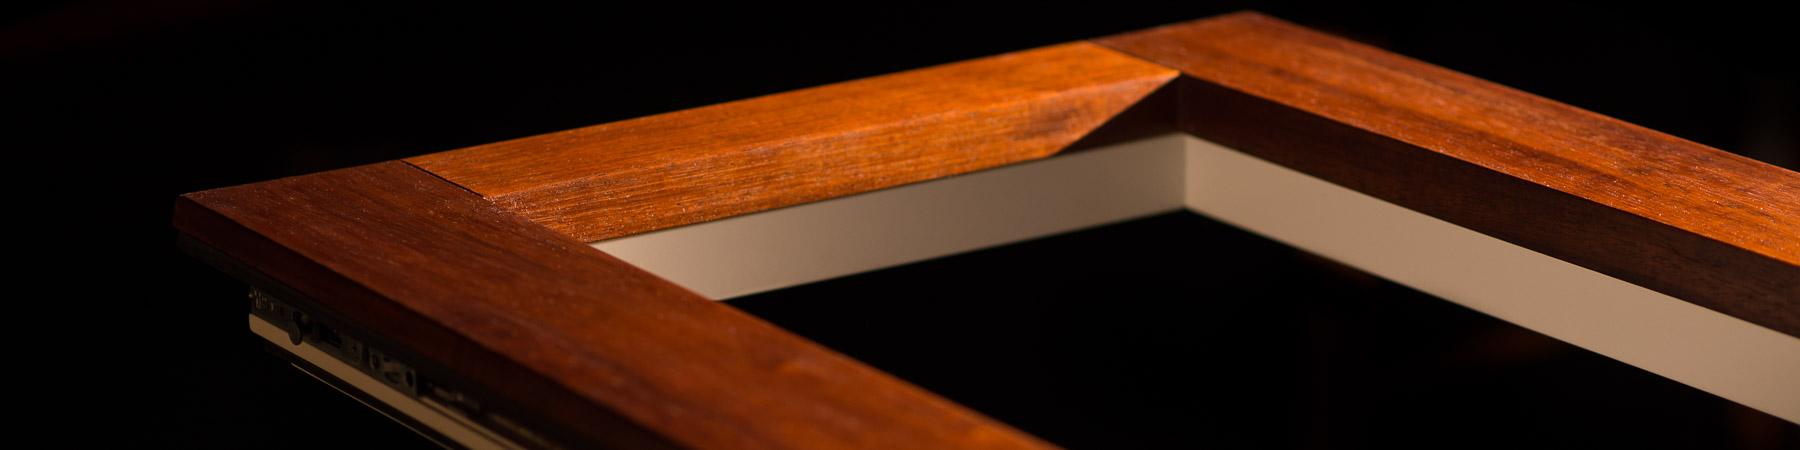 Split Finish, Luxbaum, Casement Window, Sash